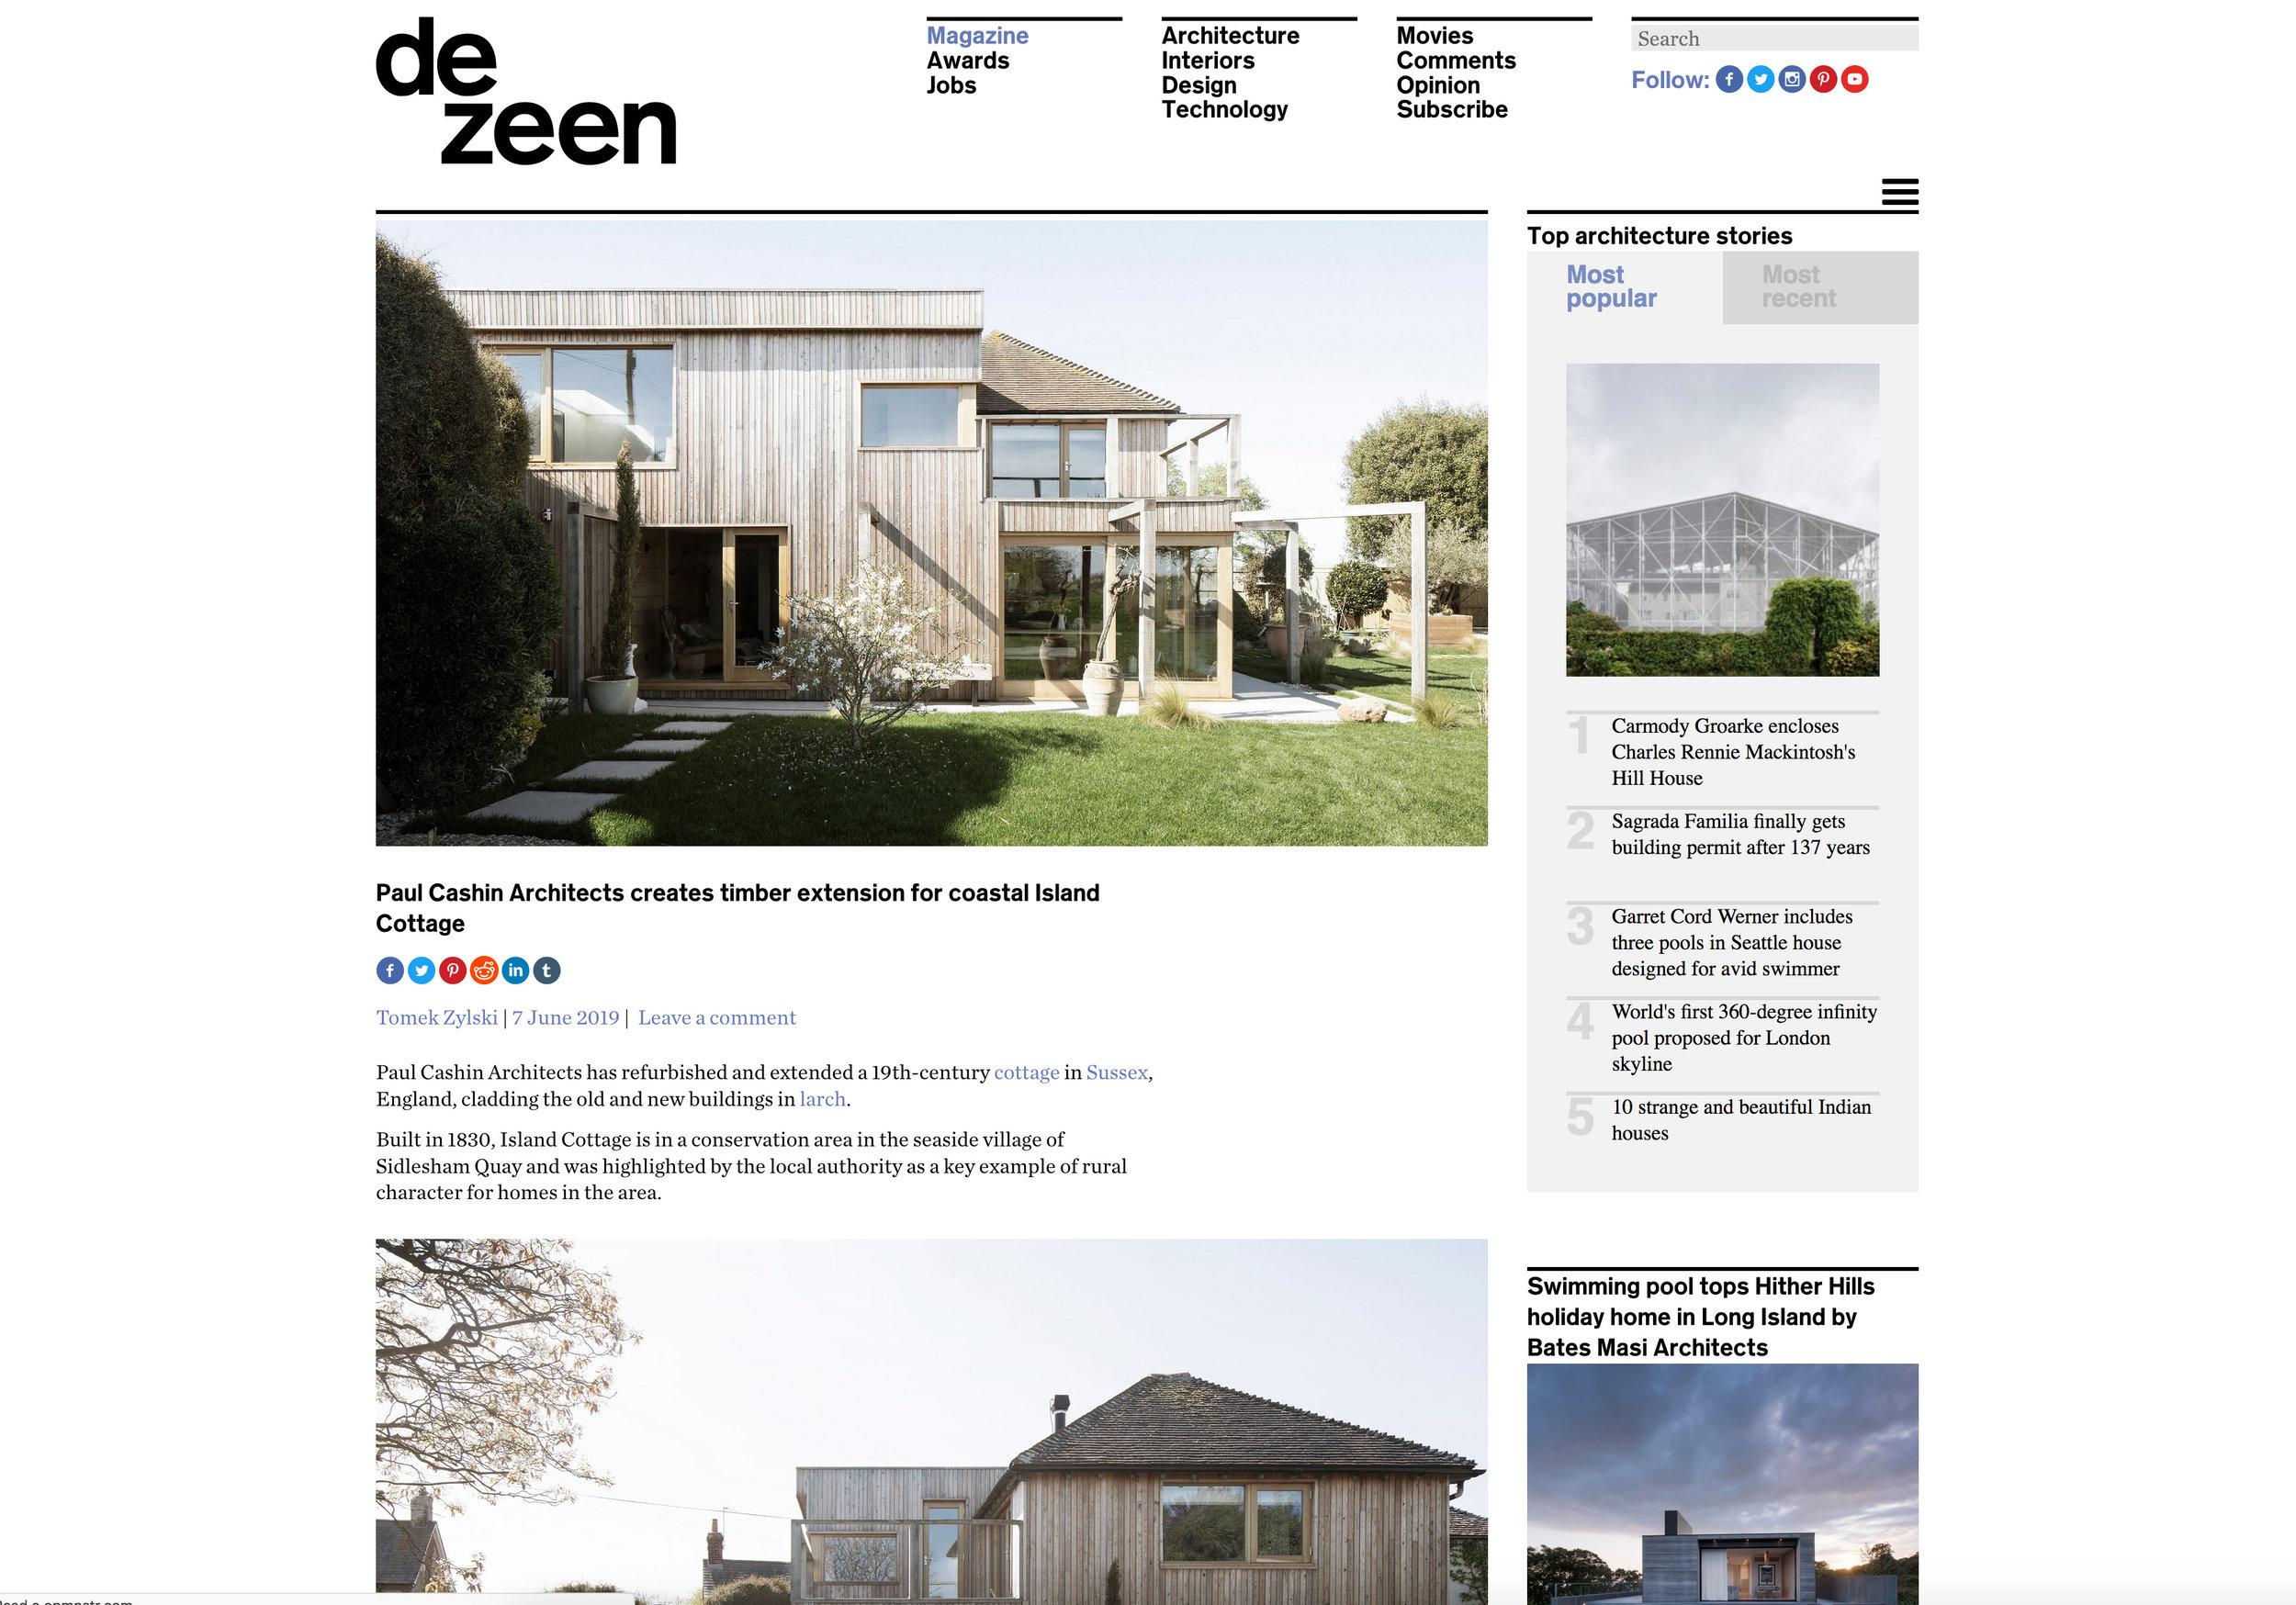 Paul Cashin Architects / Island Cottage featured on Dezeen